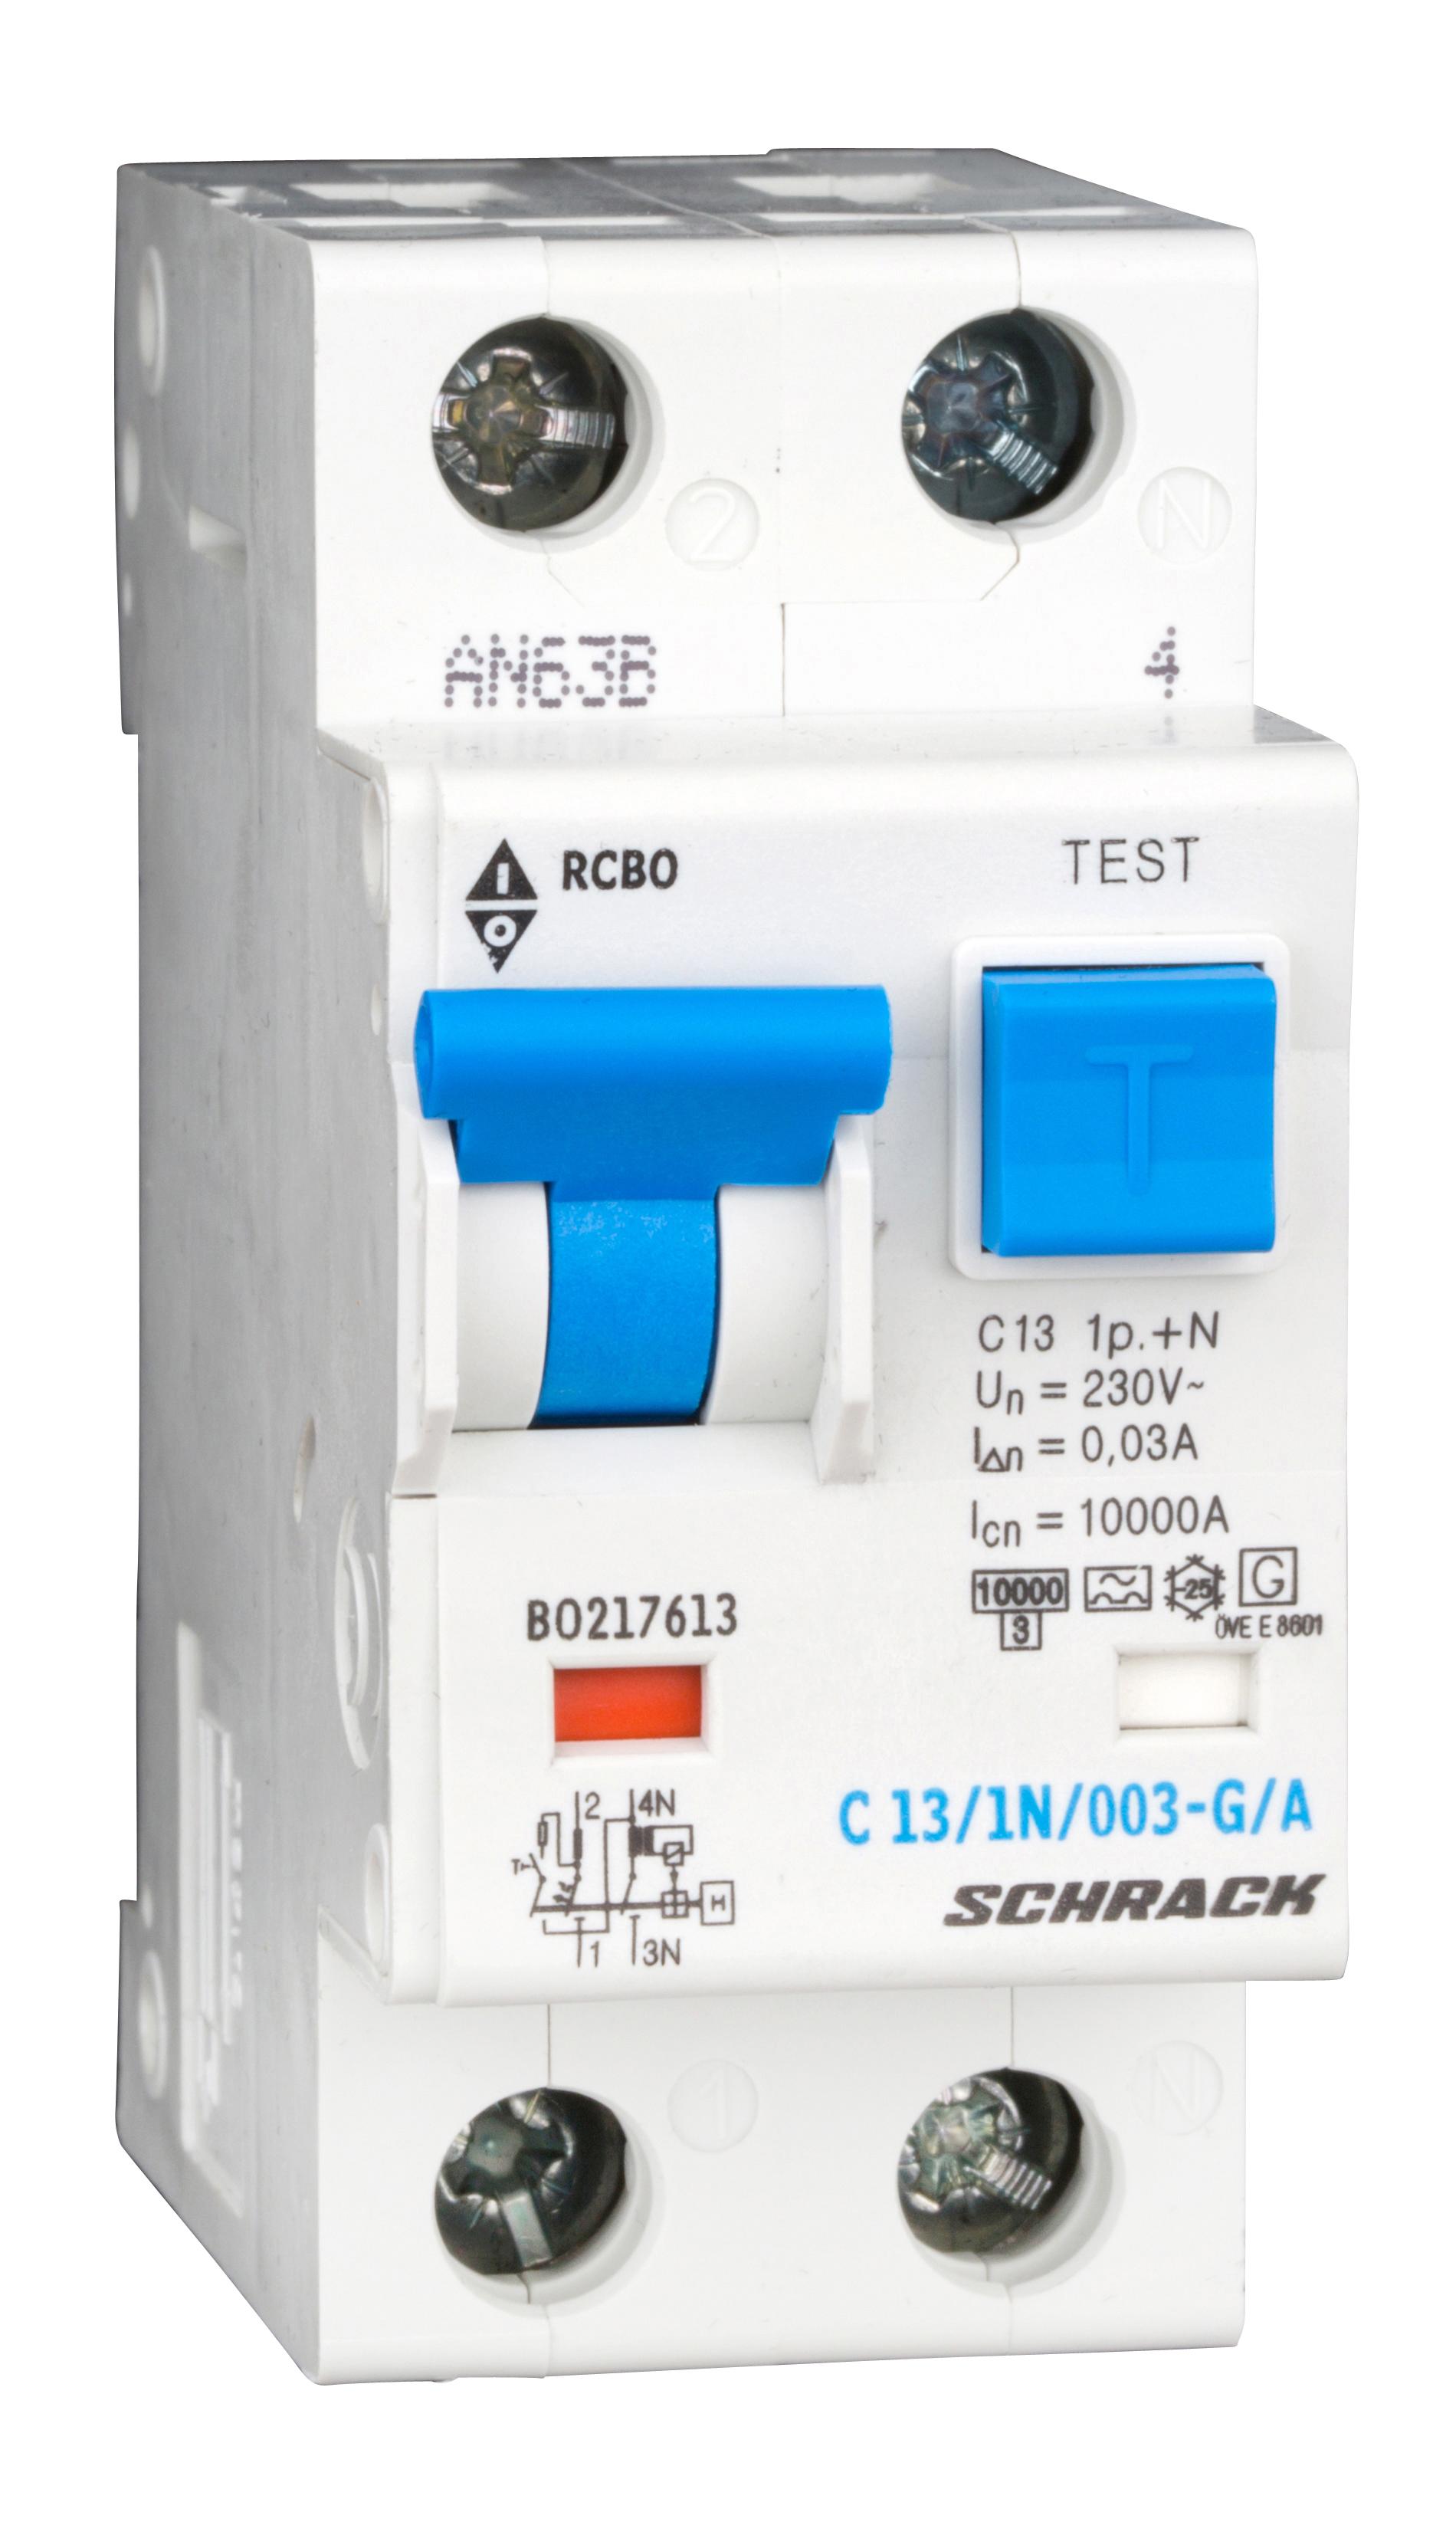 1 Stk LS-FI-Schalter,Kennl. C, 13A,30mA,1-polig+N, Bauart G,Typ A BO217613--